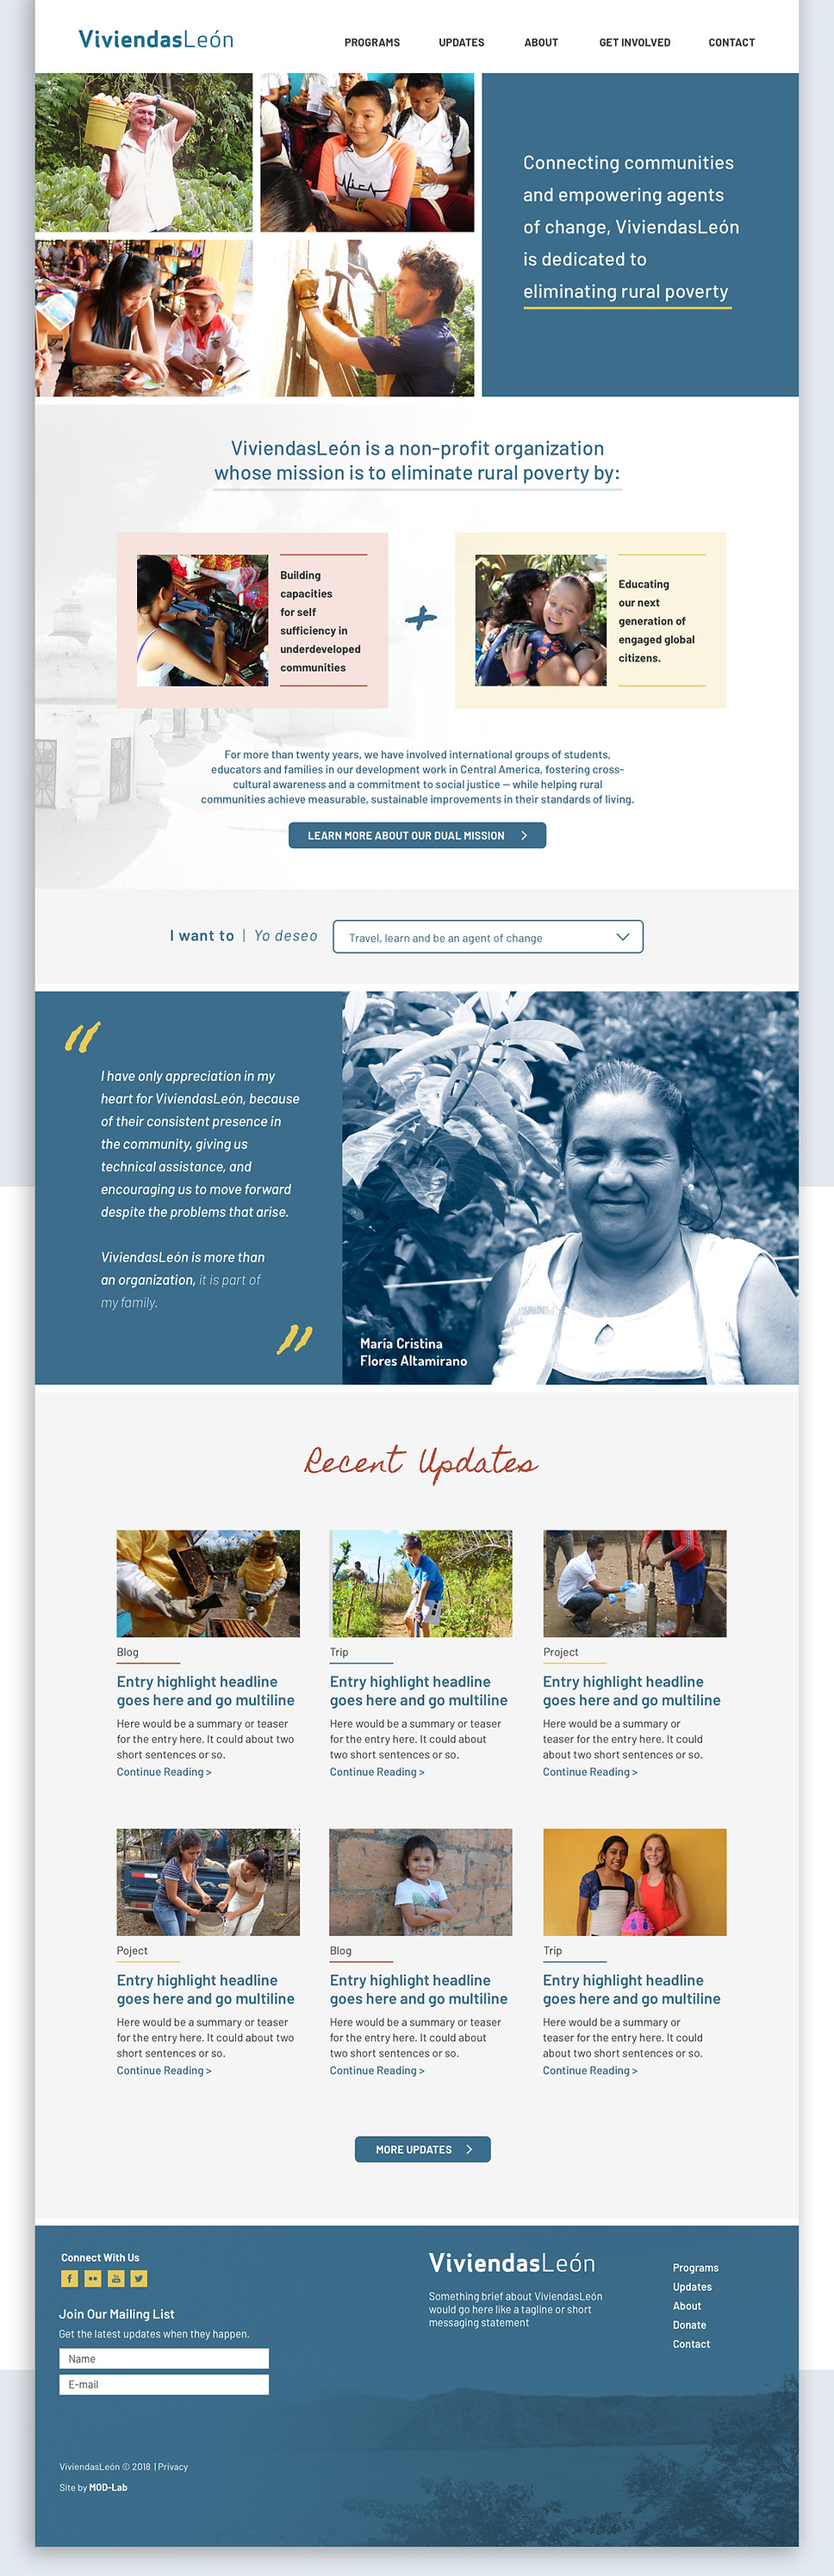 VL-web site-presentHome.jpg